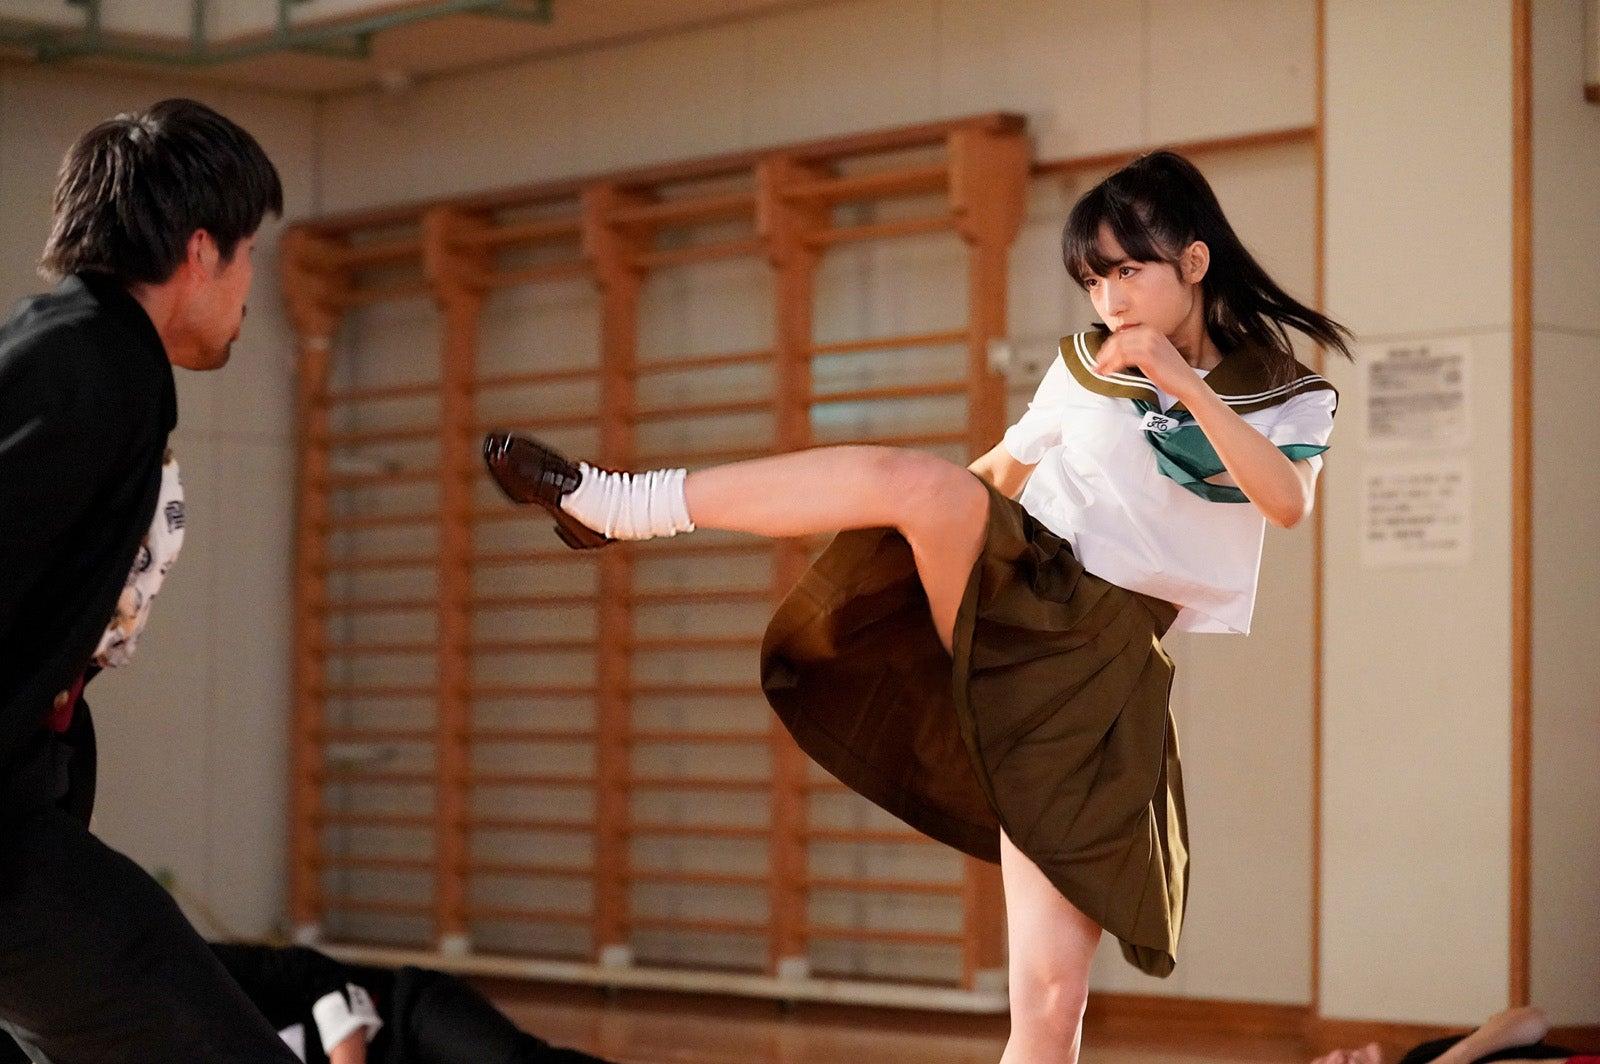 "D3eklxtOPeszCDVZ68S2 8jexEfBGKLBtpwpr38og00 - 【AKB48】「2万年に1人の美少女」小栗有以、強い眼差しにノックアウト ""平成のジャンヌダルク""に"